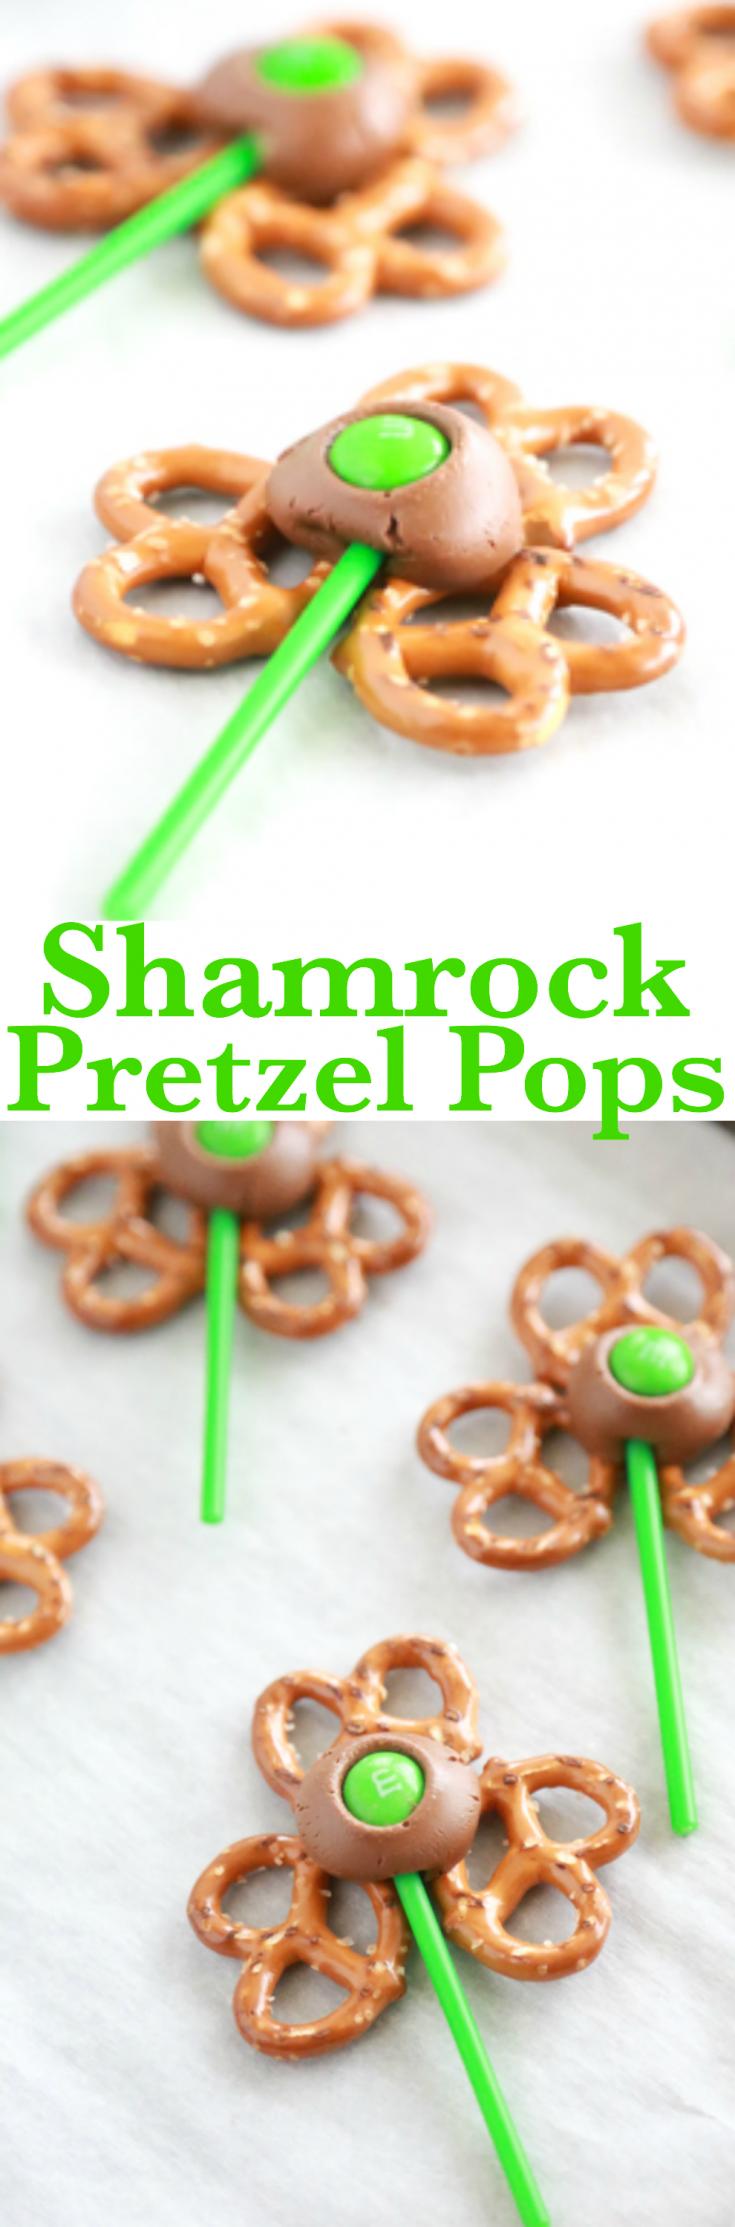 If you have 5 minutes, you have all the time it takes to make these Shamrock Pretzel Pops. #StPatricksDay #StPattysDay #Shamrock